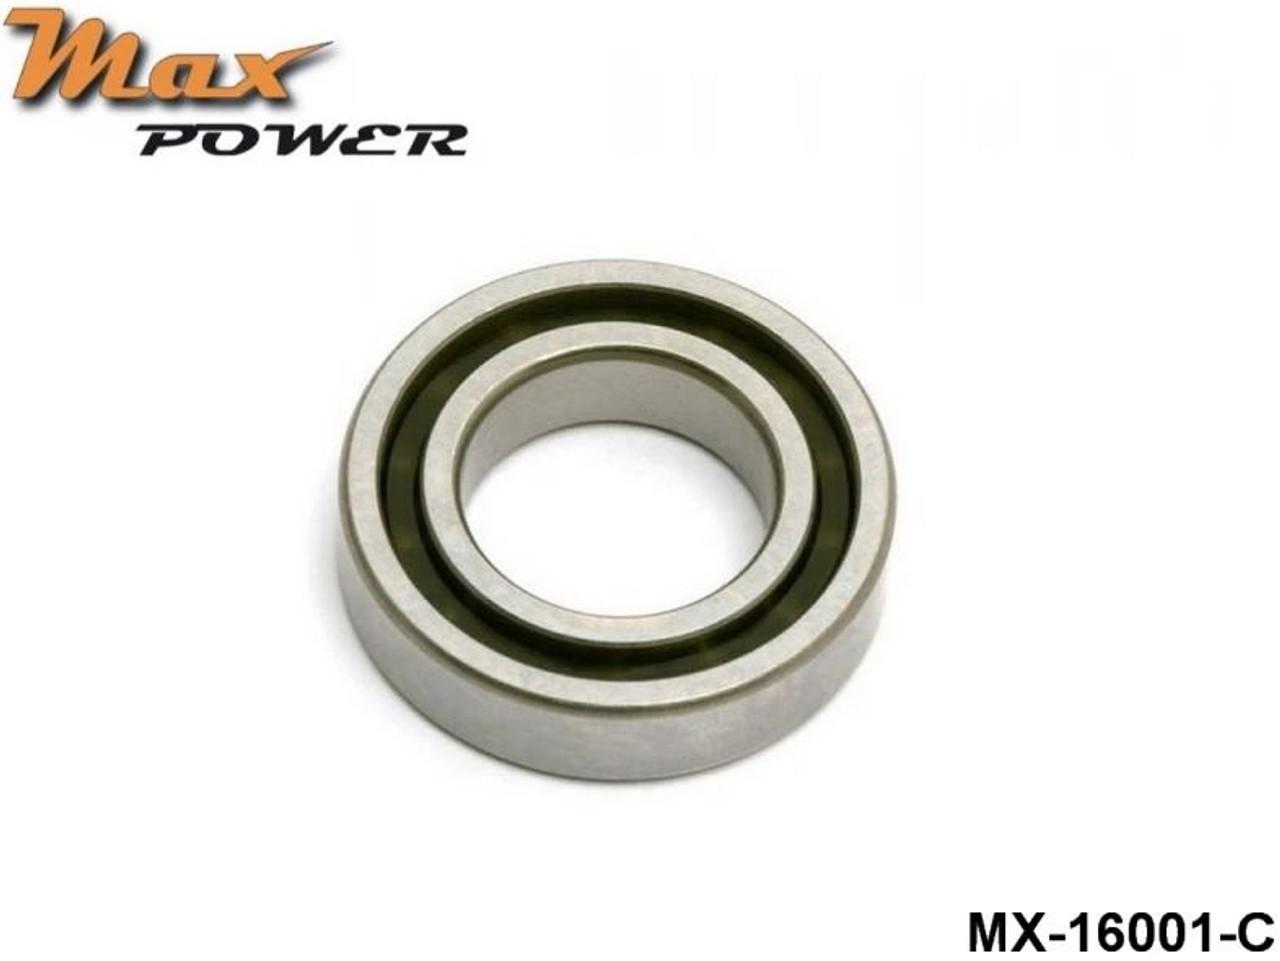 Max Power Special Ceramic Rear Bearing 14.5 x 26 x 6